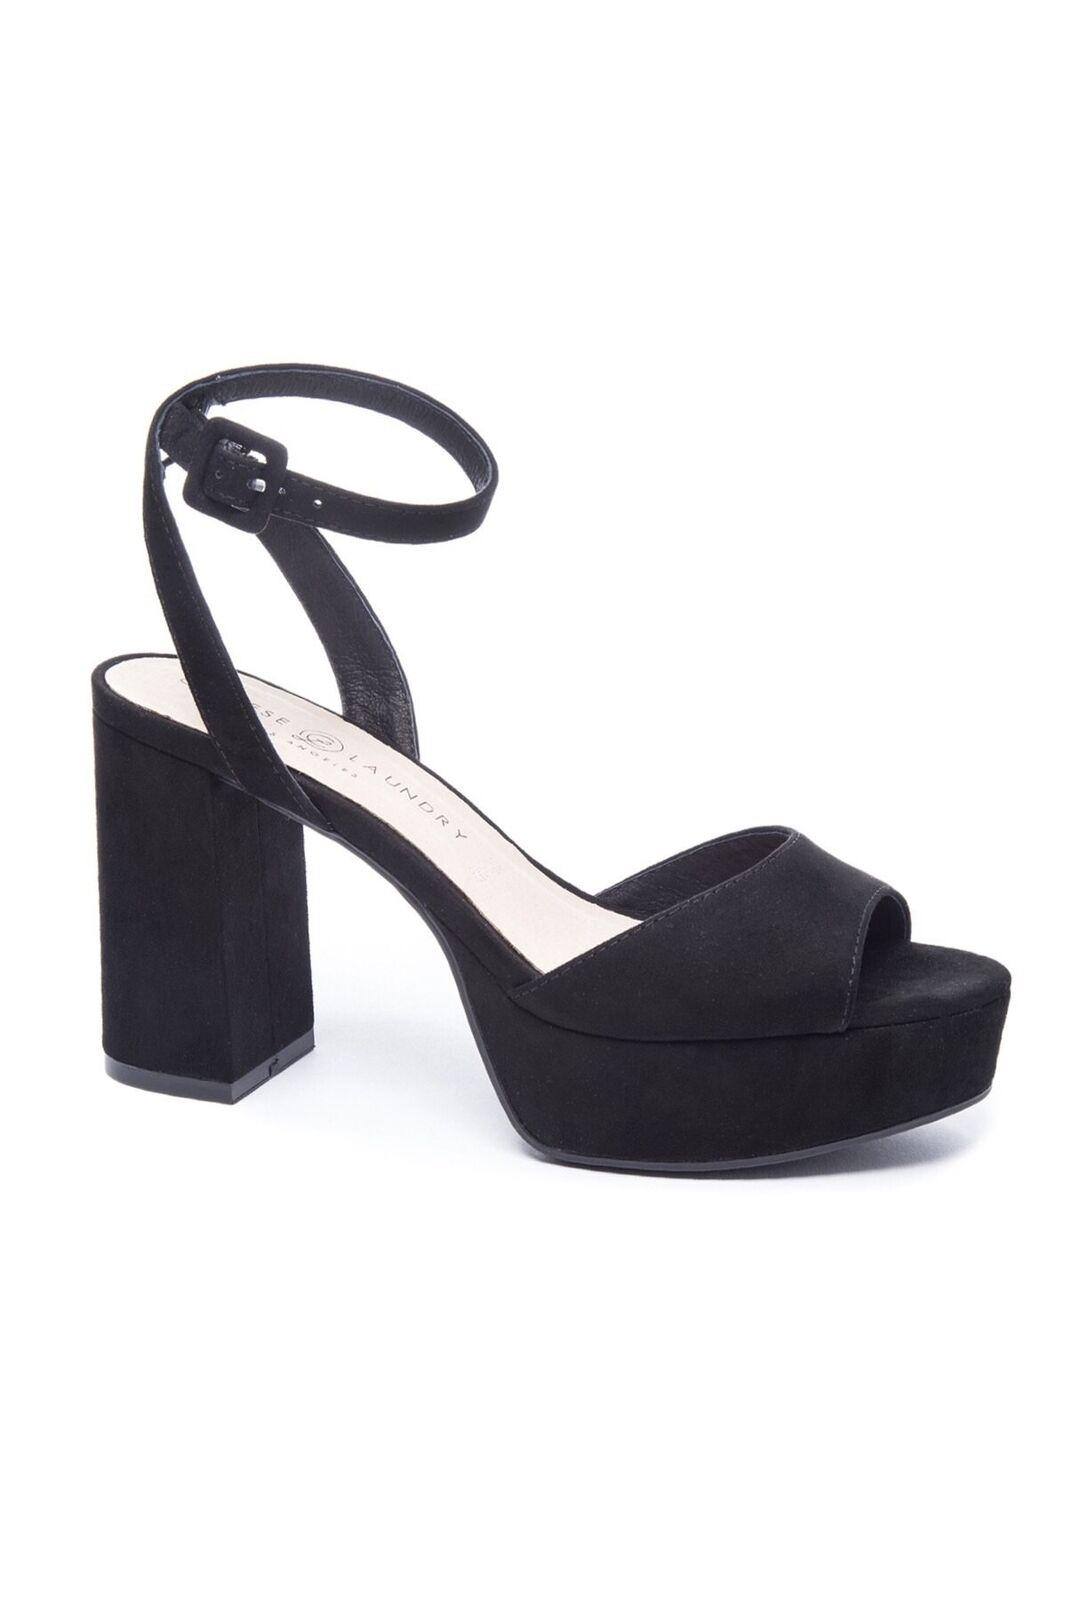 5b5deb7af9 Chinese Laundry Theresa High Heel Platform Sandal - Black 6 for sale ...